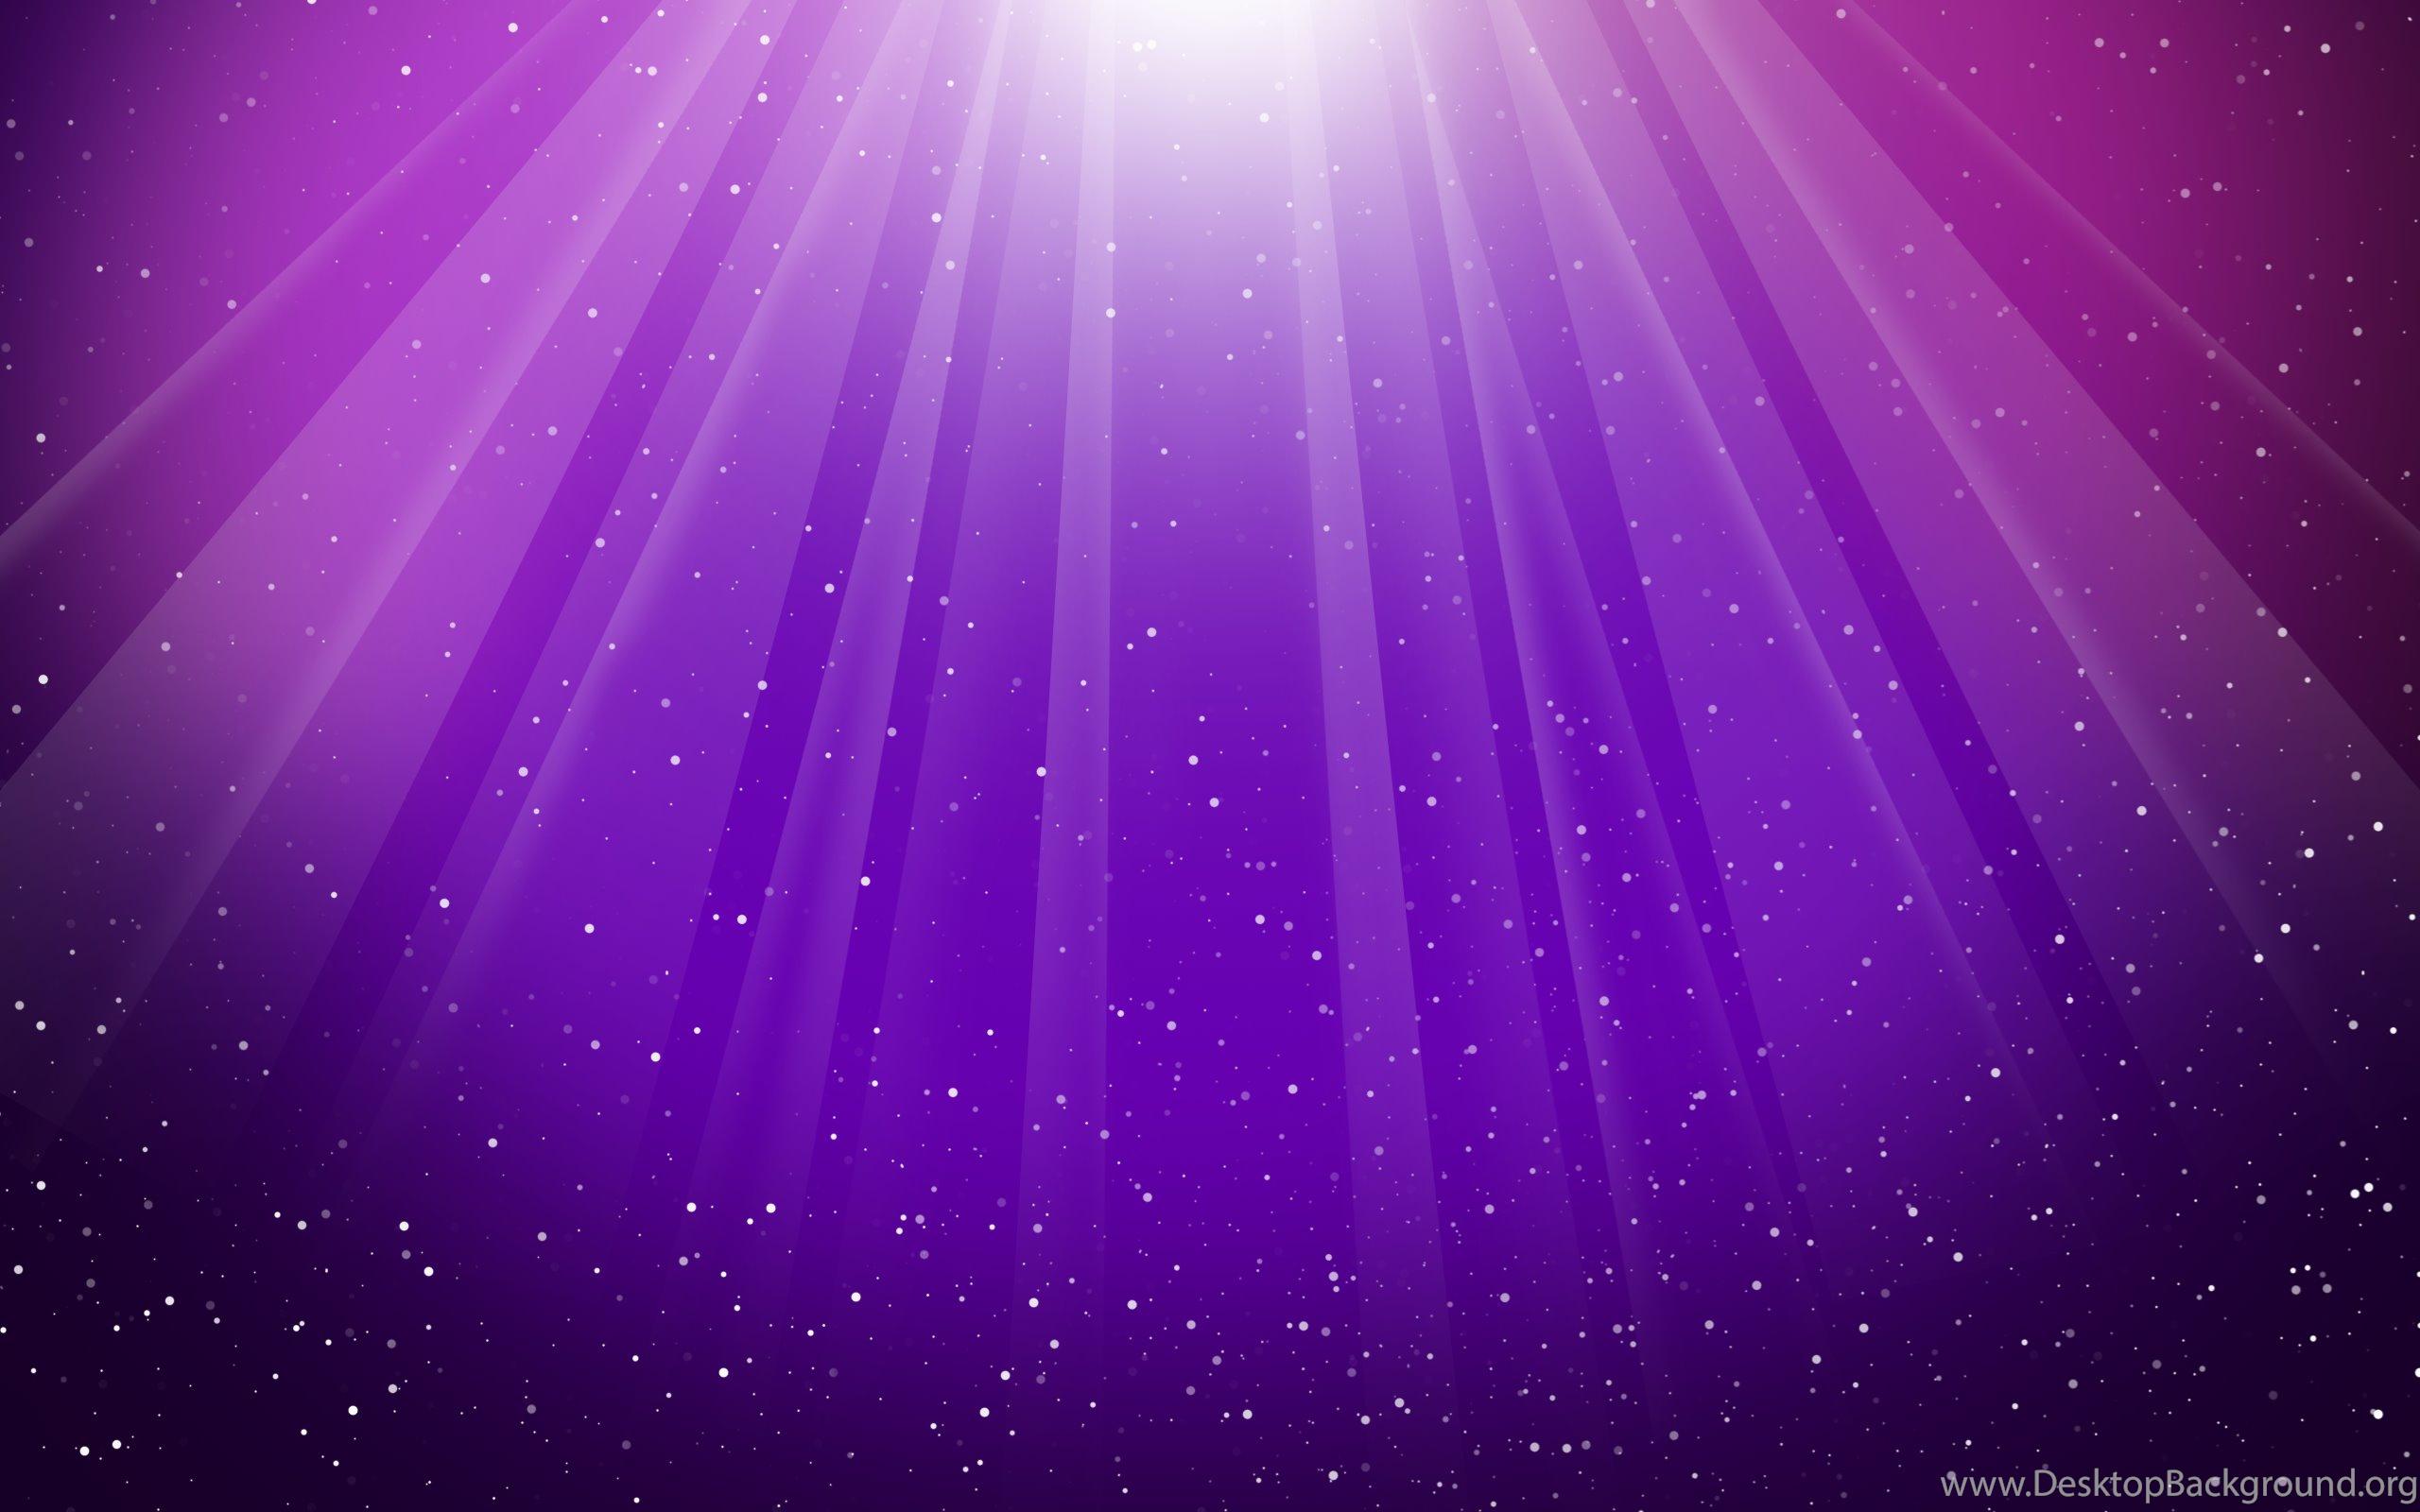 Abstract Purple Background Hd Desktop Wallpapers Png Desktop Background